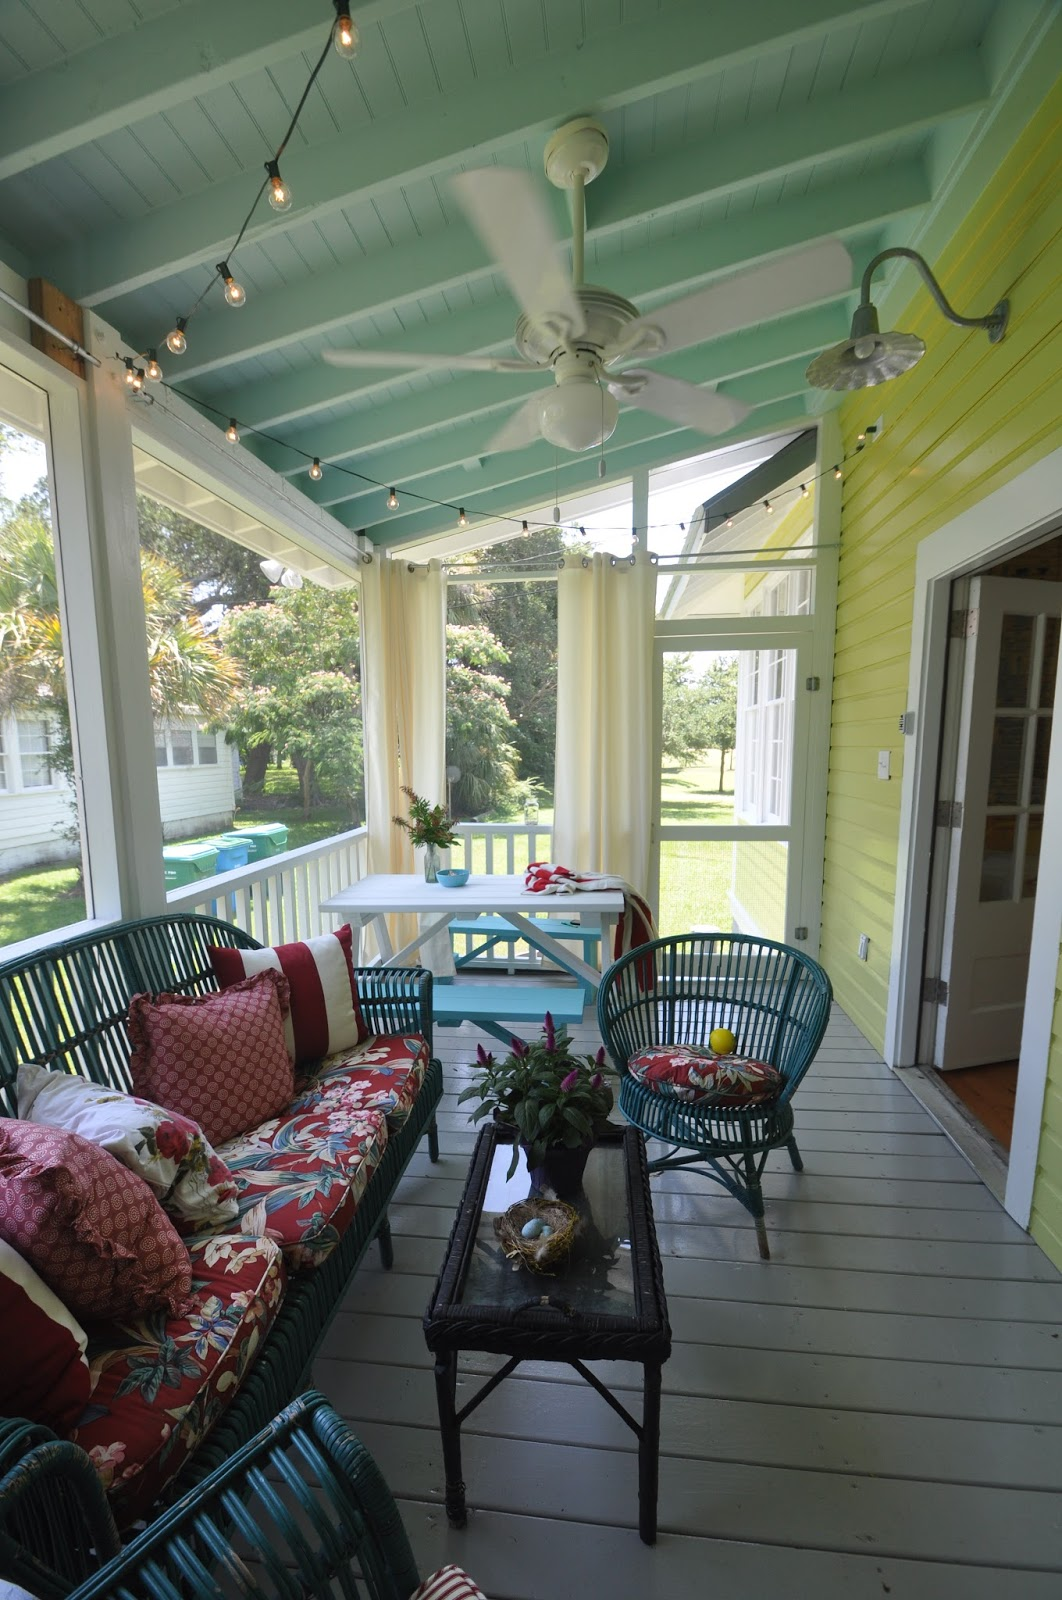 Jane Coslick Cottages My Favorite Bedroom And More: Jane Coslick Cottages : New Beds..New Porch... New